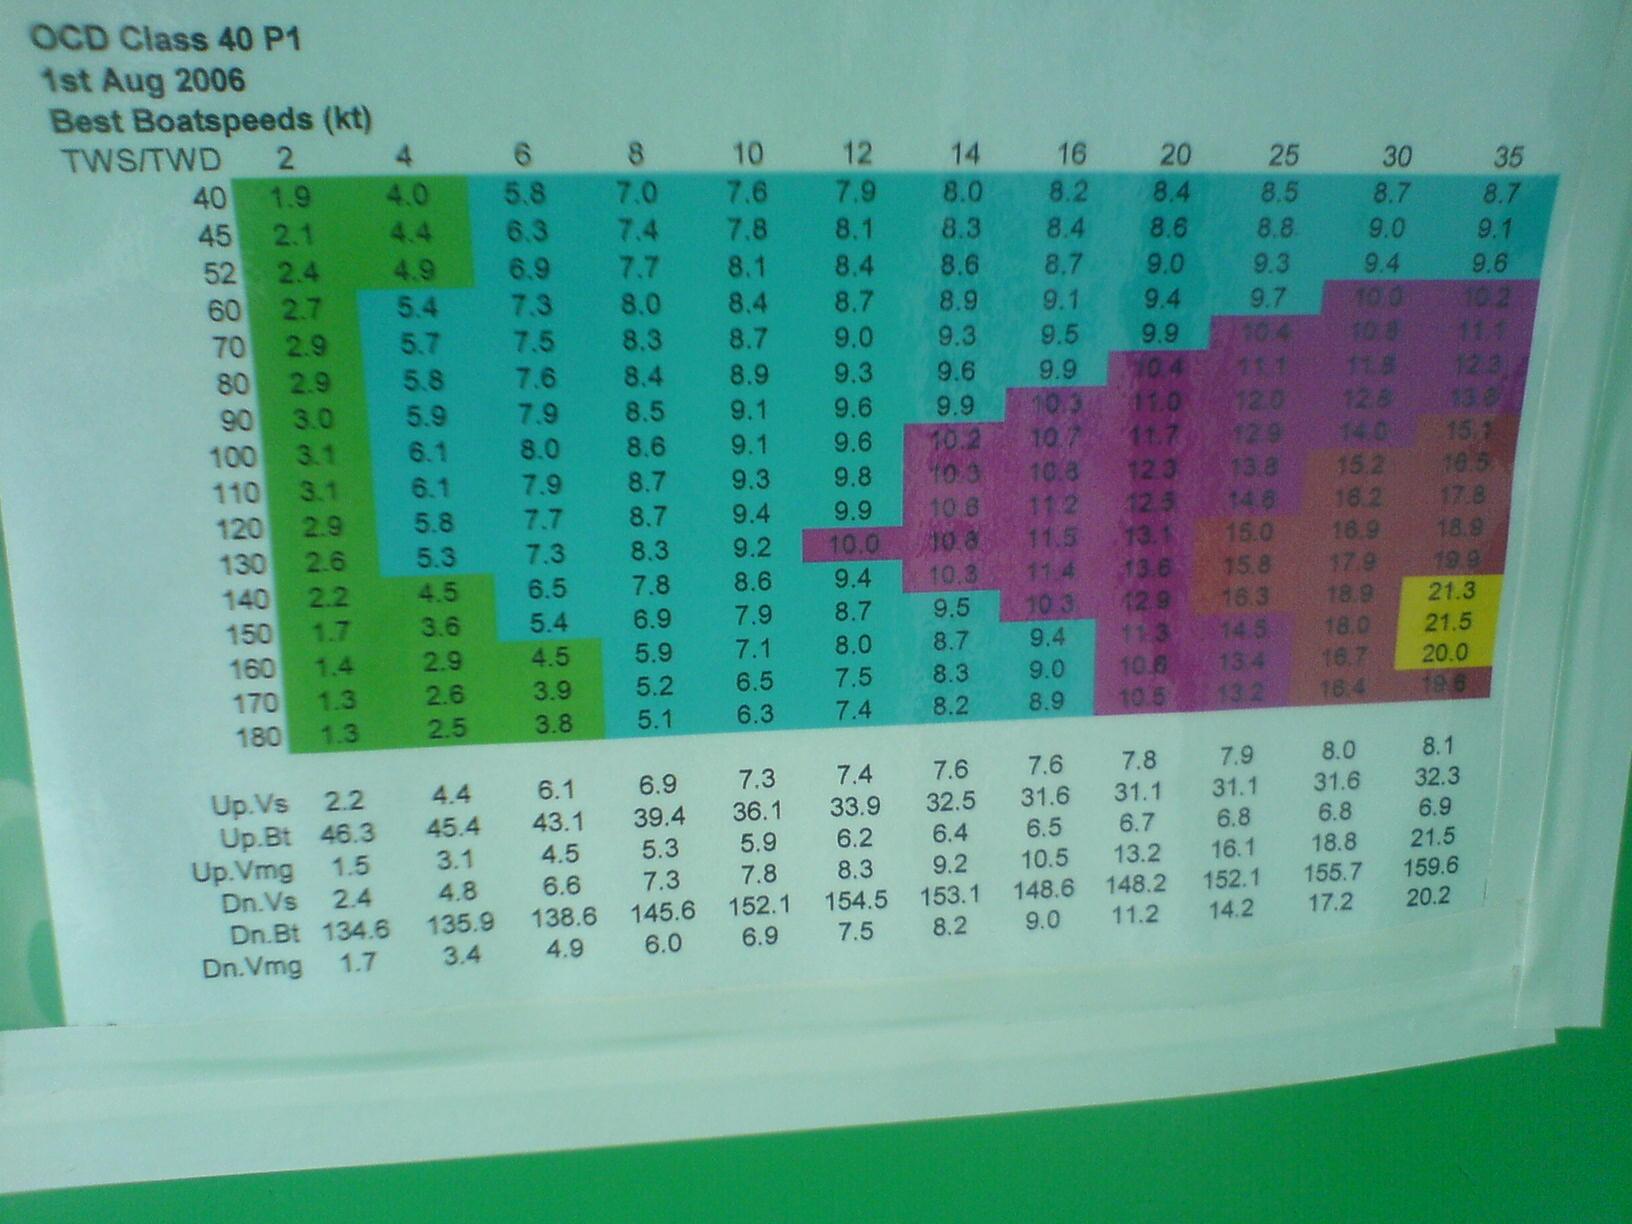 Dehler 38/Pacer 376 · Dehler 44; Drake (Høj Jensen, North Tuning Guide)